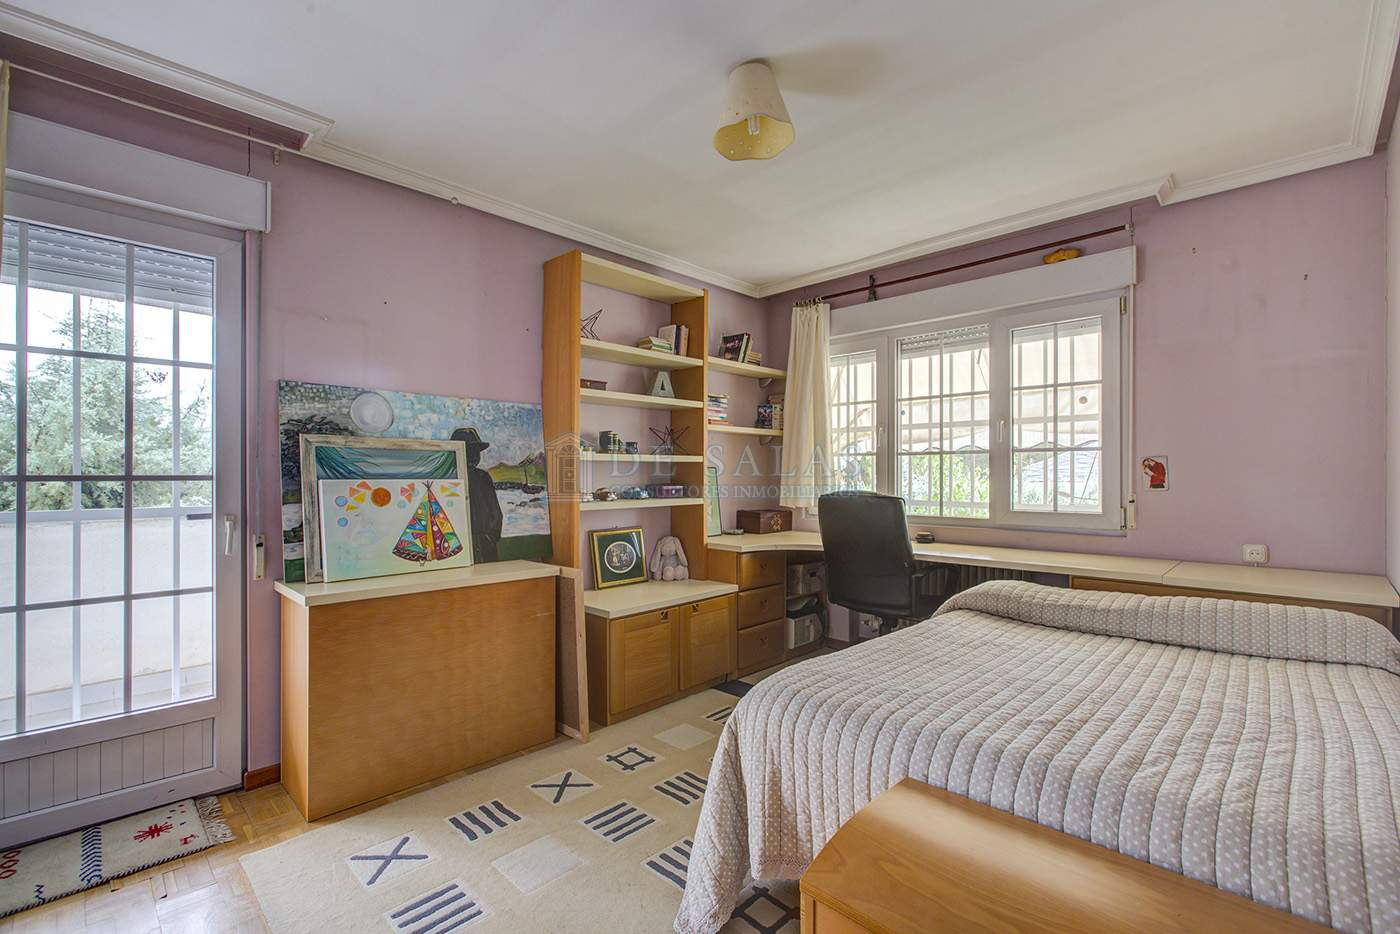 IMG_3045_6_7-Dormitorio